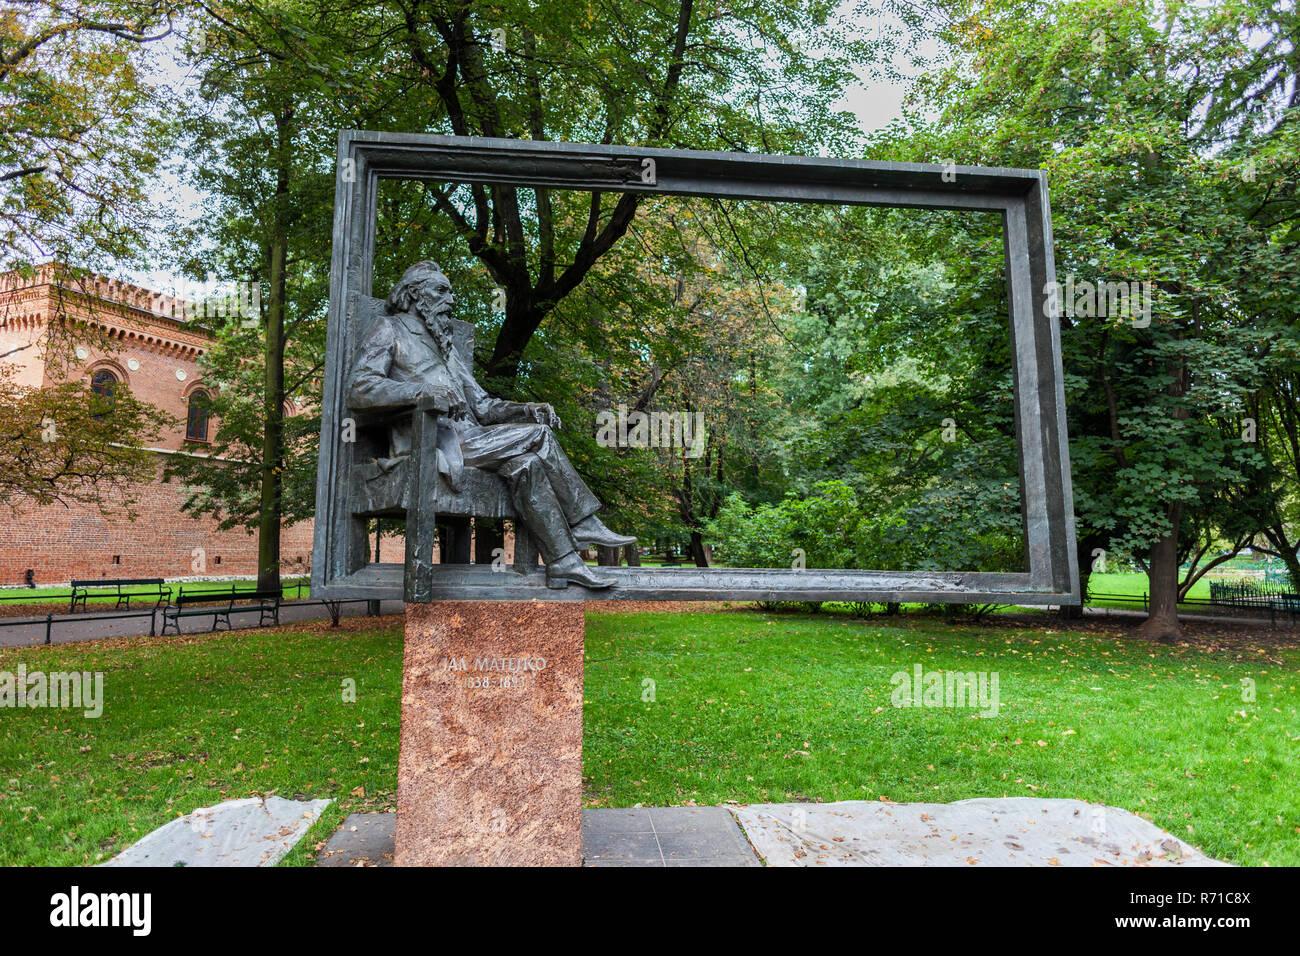 Jan Matejko Monument in Krakow, Poland, 19th century Polish painter (1838-1893). - Stock Image